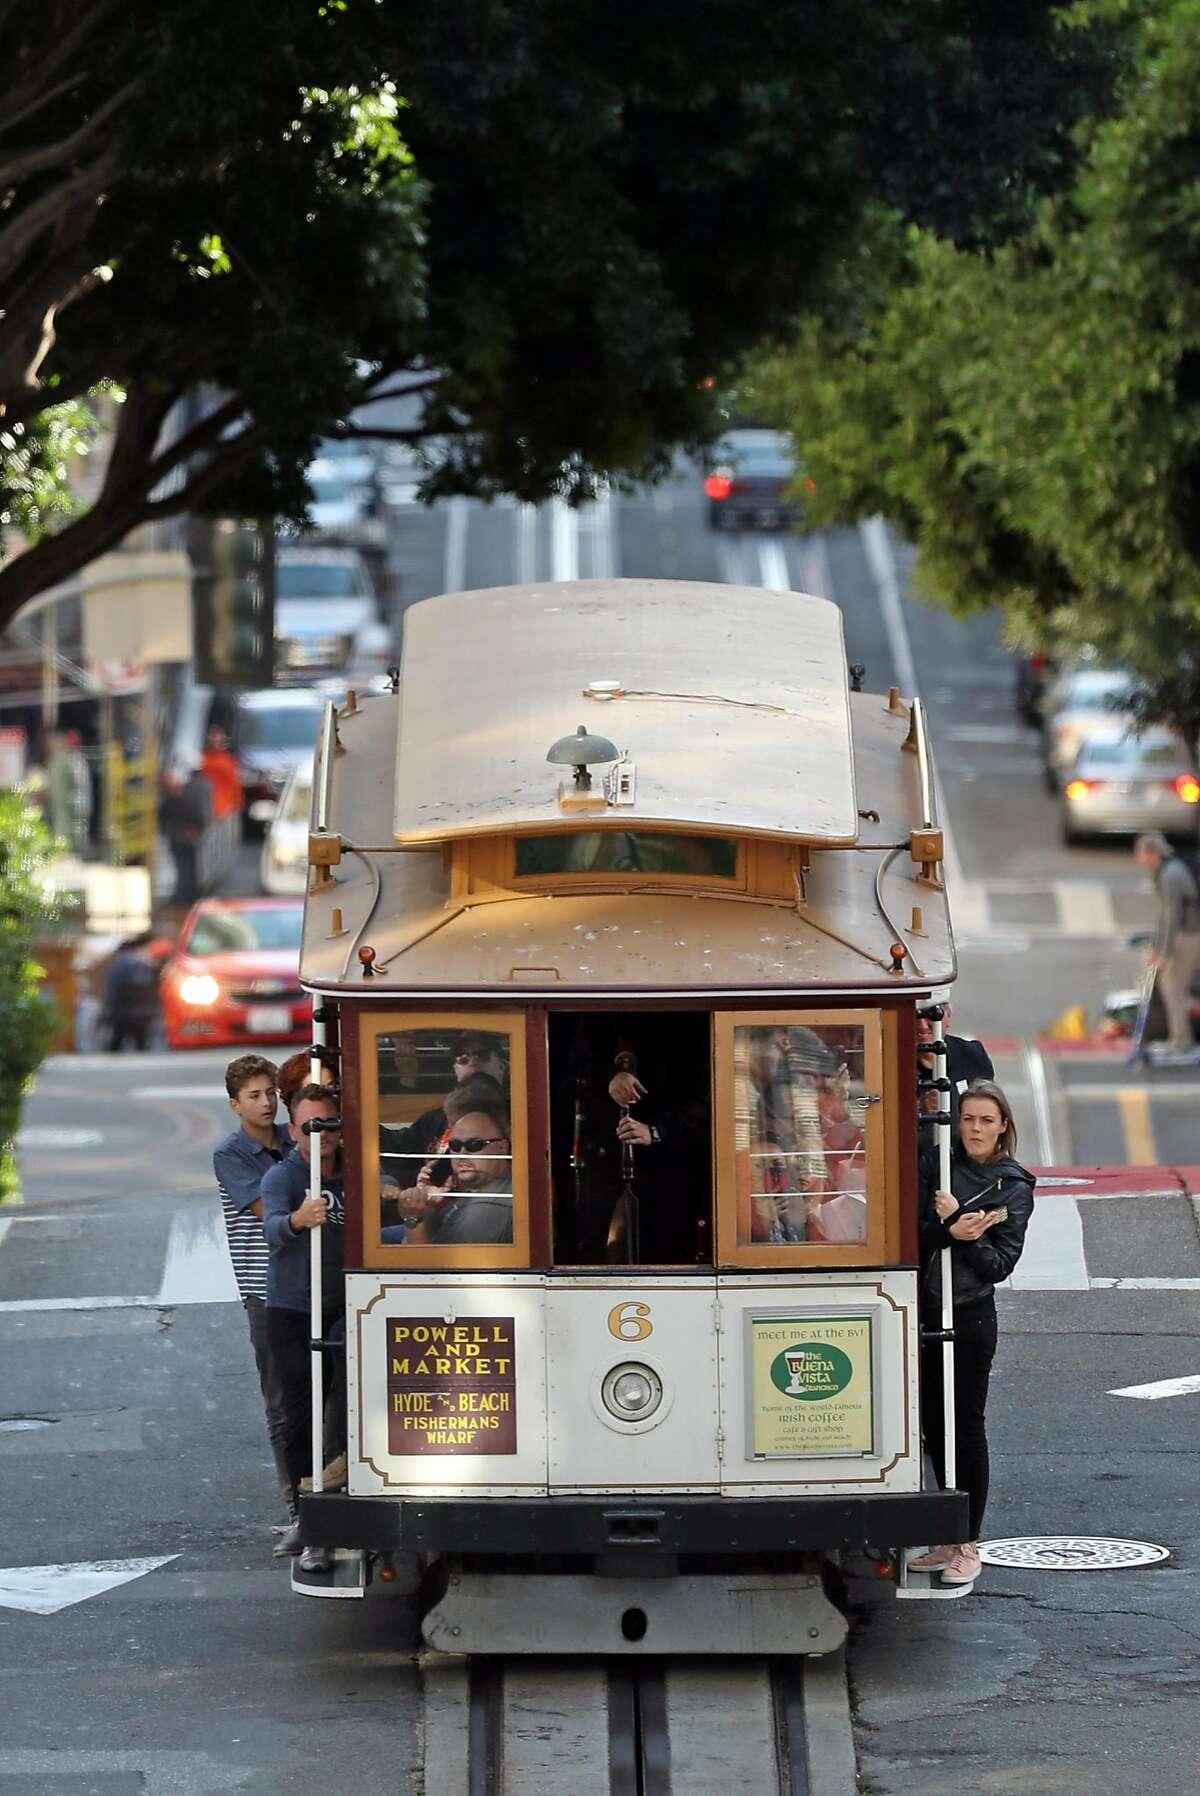 Cable Car on California Street in San Francisco, Calif., on Thursday, November 2, 2017.